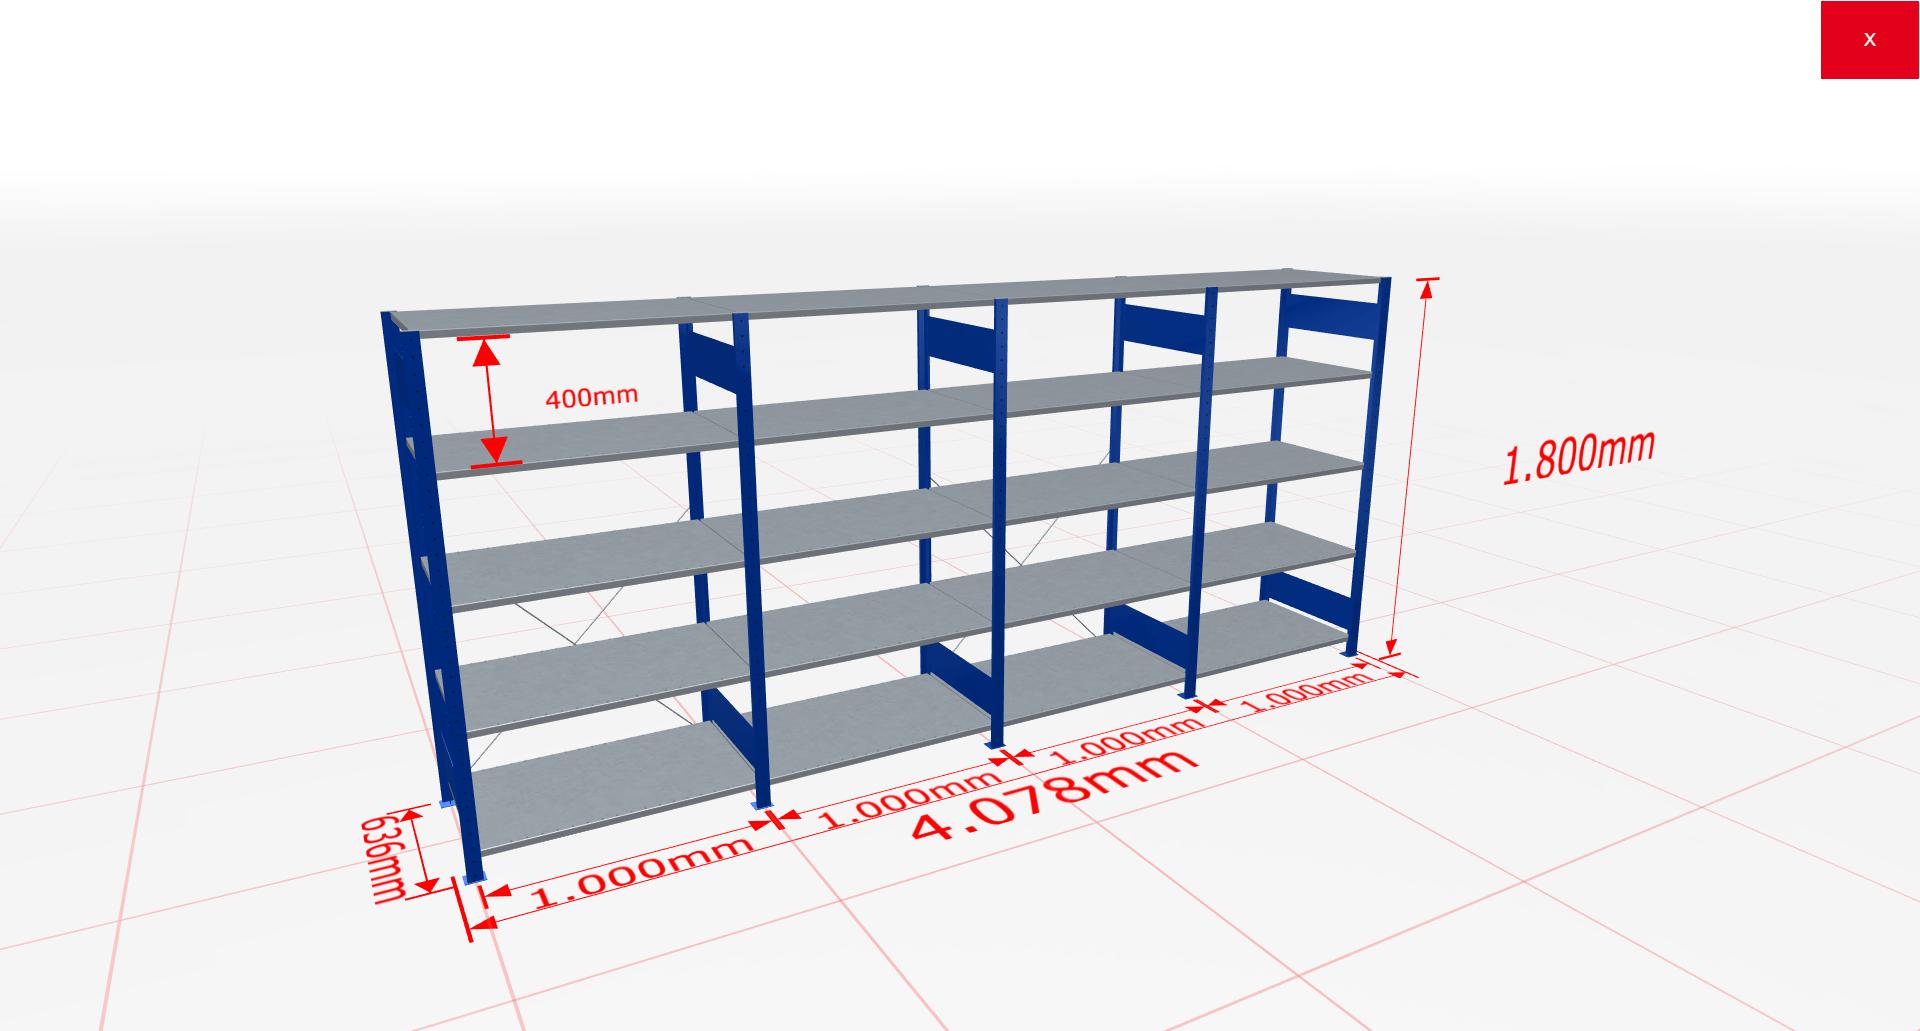 Fachbodenregal Komplettregal 1800x4078x600 mm (HxBxT) SCHULTE Lagertechnik blau 5 Ebenen  150 kg je Boden